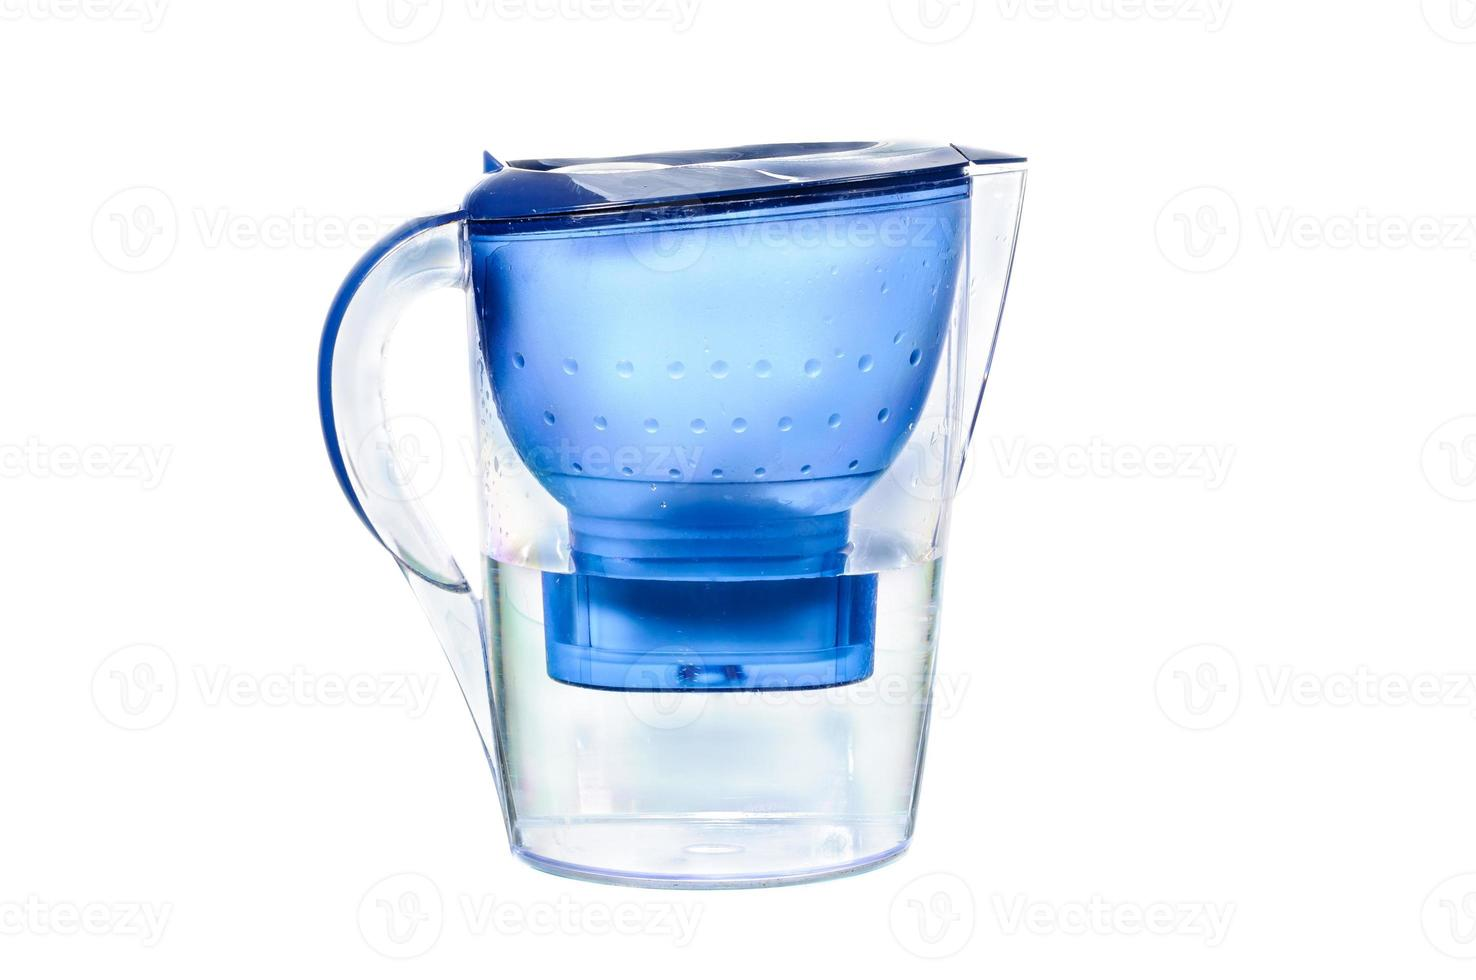 vers gefilterd water om te drinken foto